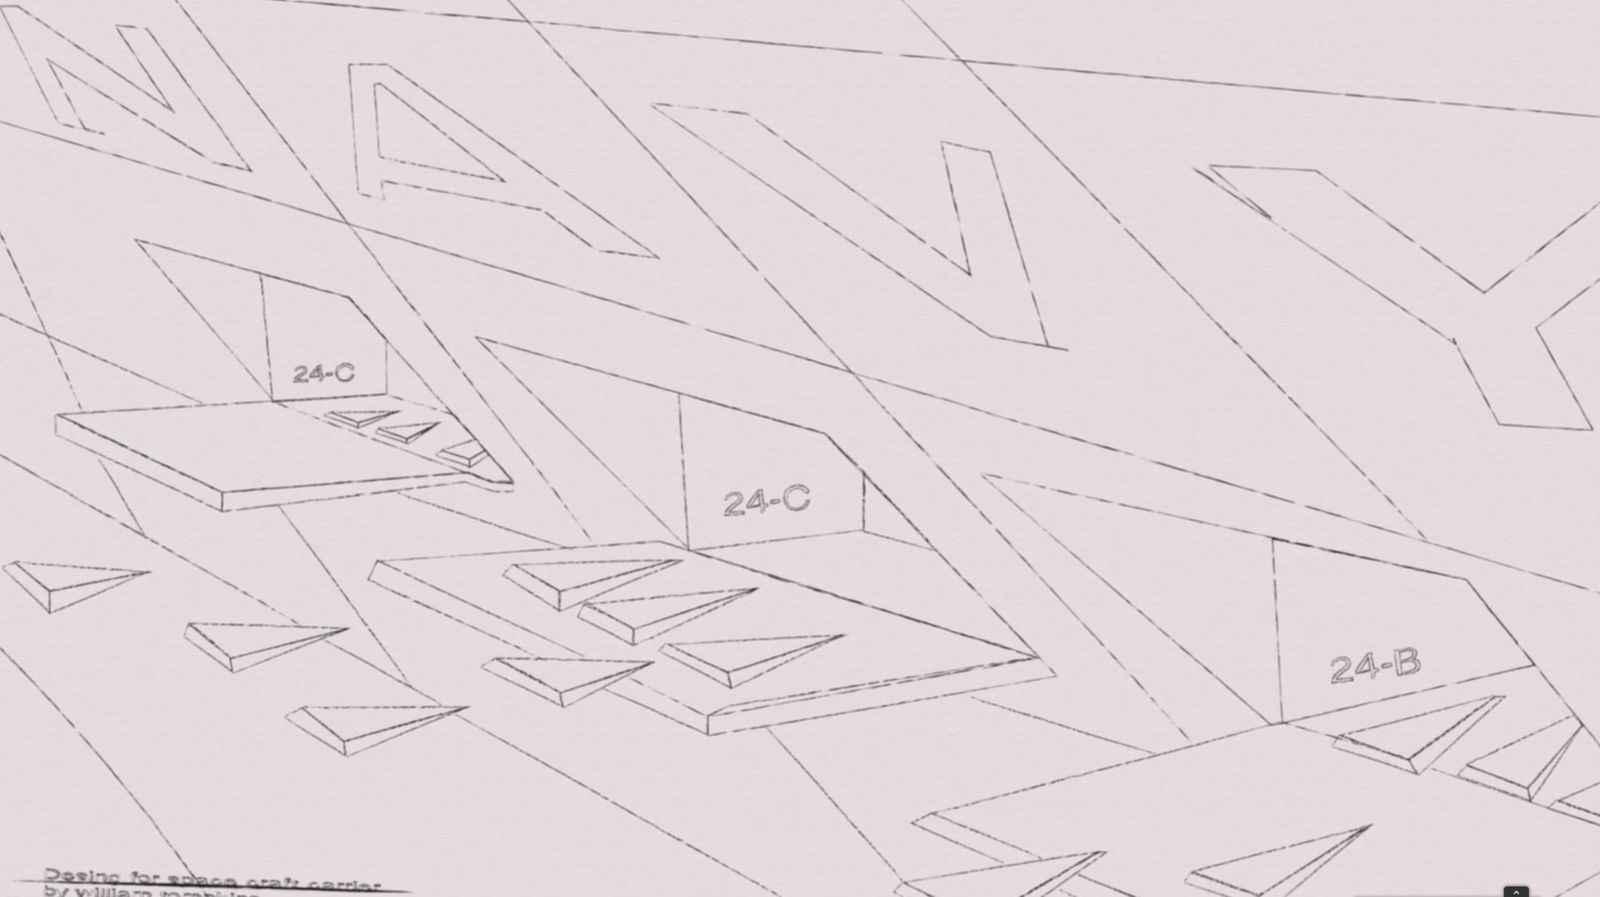 3b_Drawing_of_hull.jpg